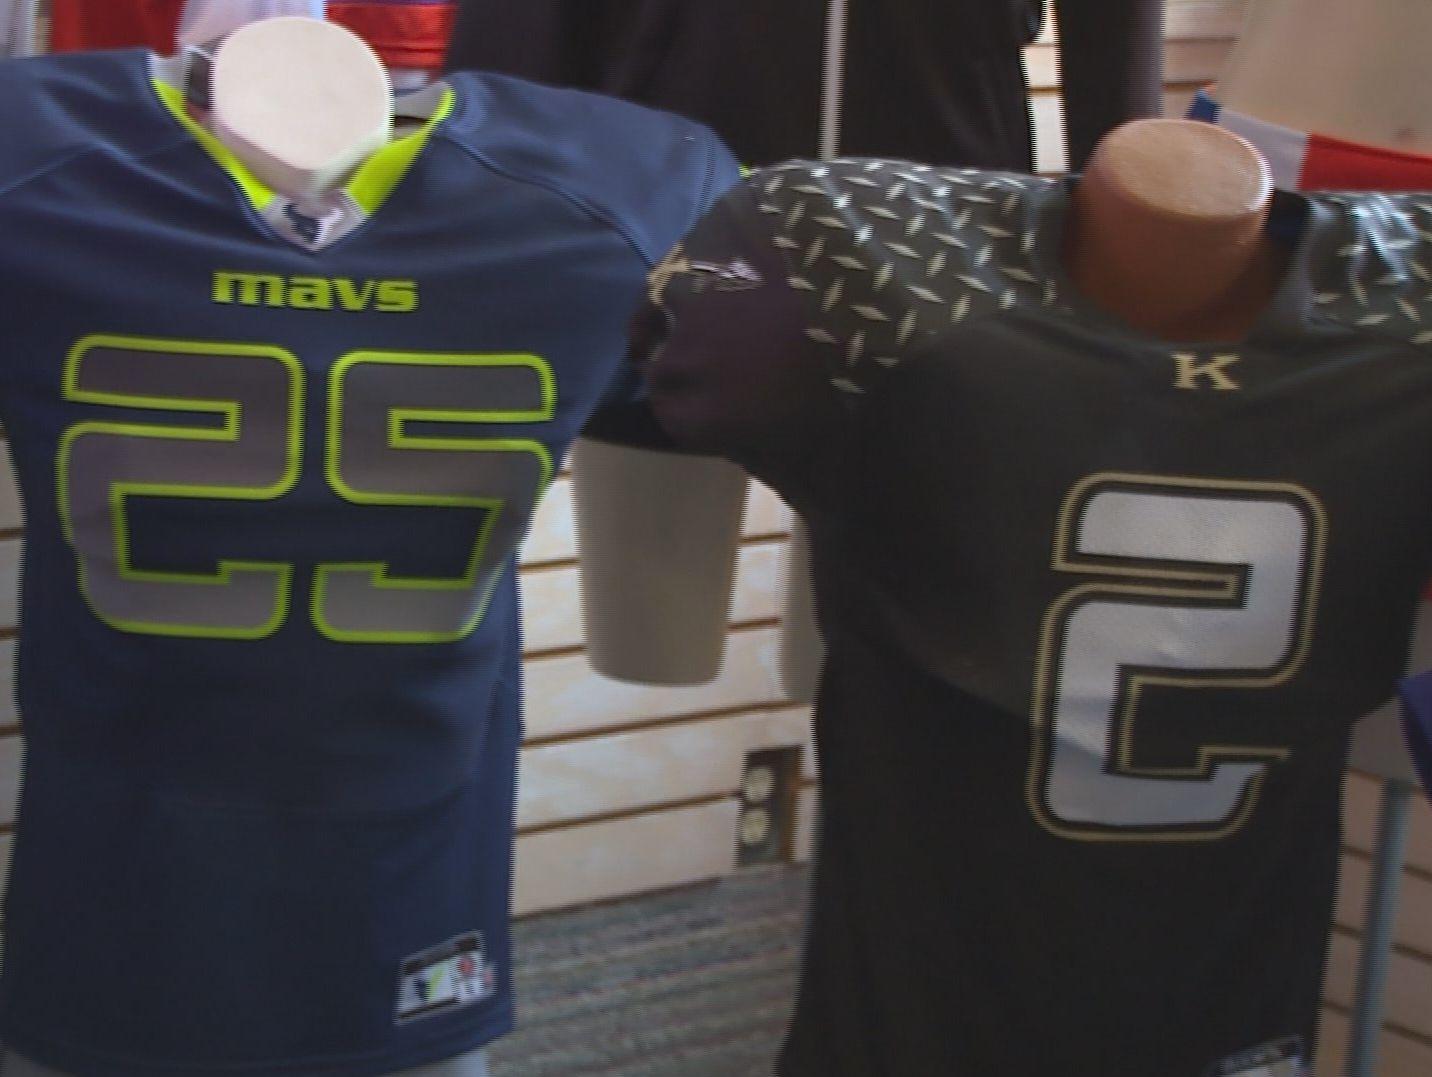 Mountain View Mavericks and Kuna Kavemen football jerseys.